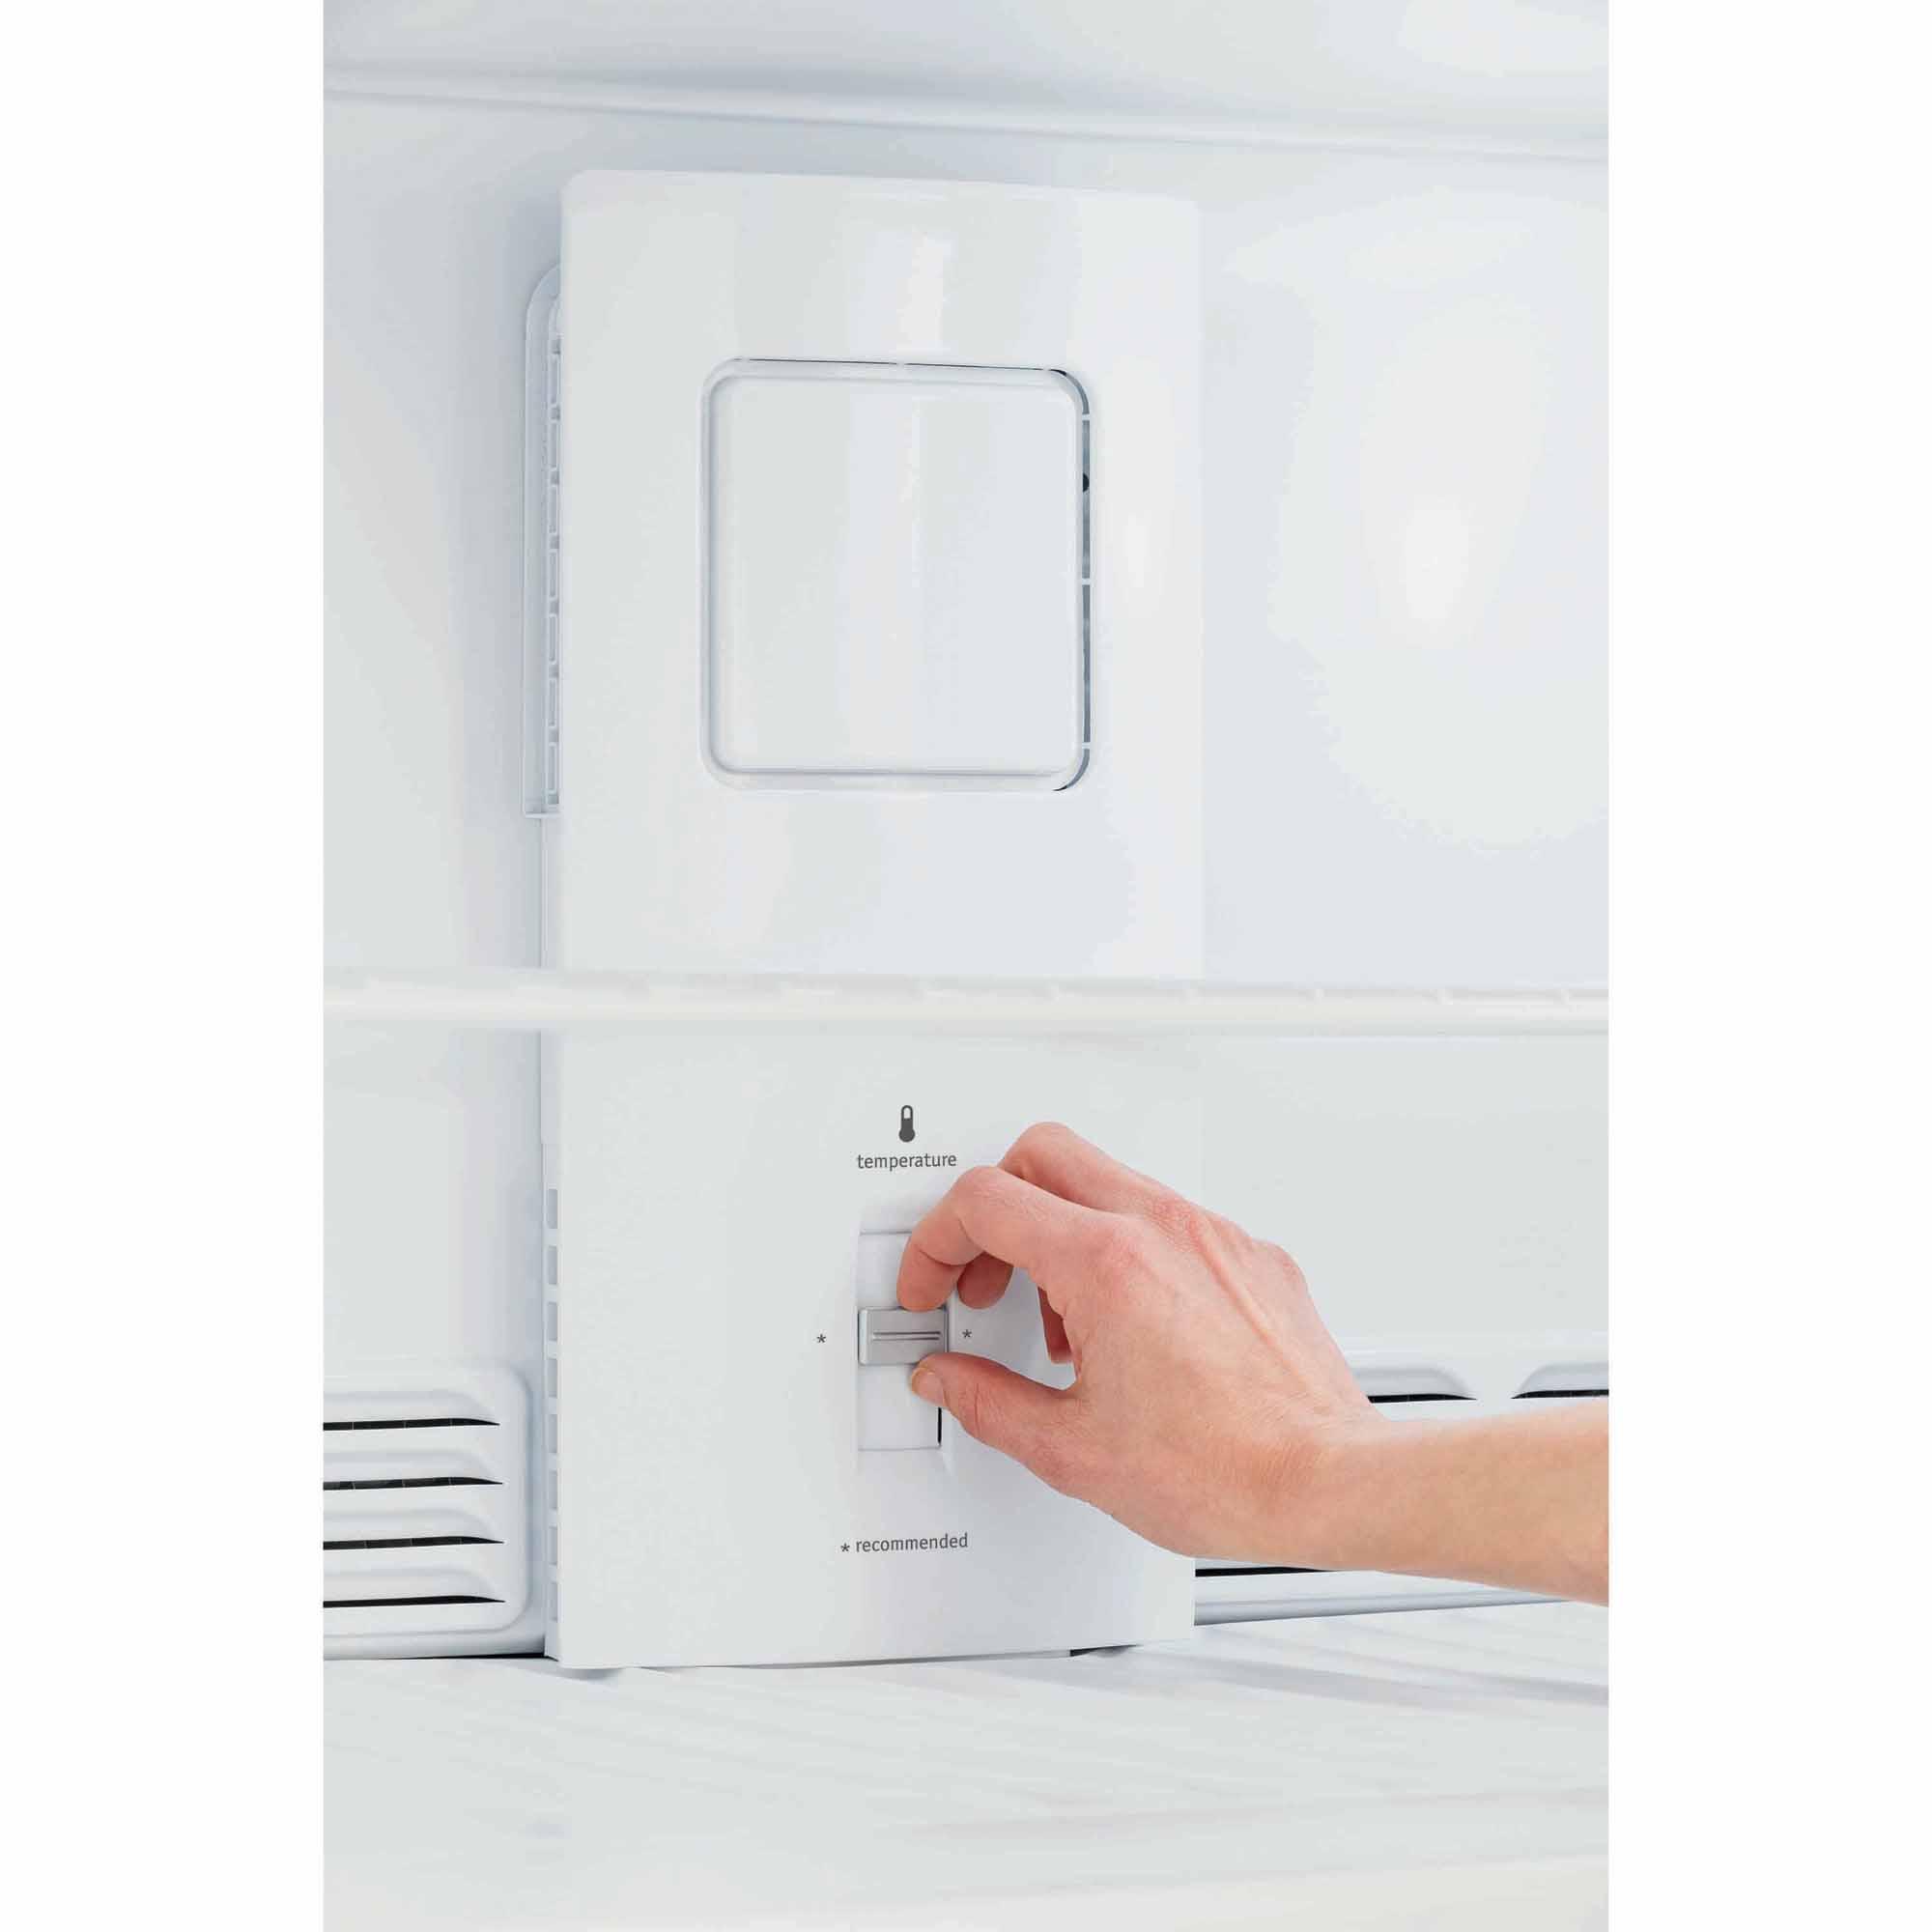 Frigidaire FFTR2021QB 20.4 cu. ft. Top Freezer Refrigerator - Black